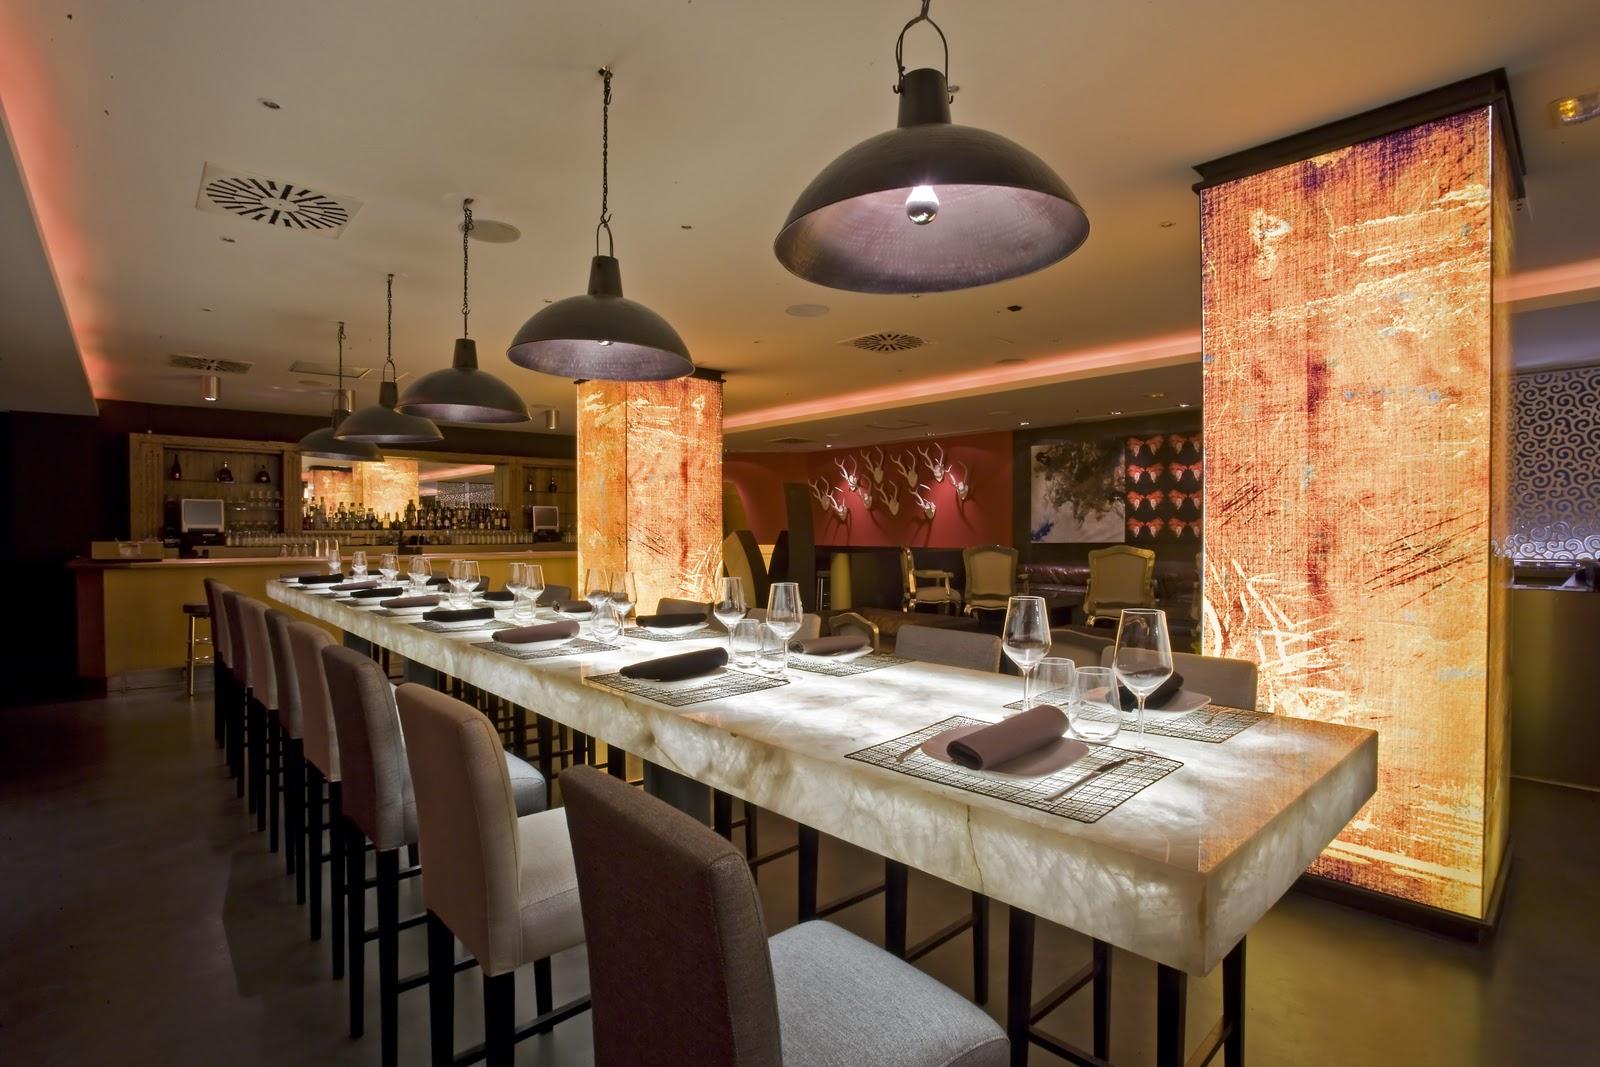 Los Sitios De Sambuquita Eccola Kitchen Club See Be Seen